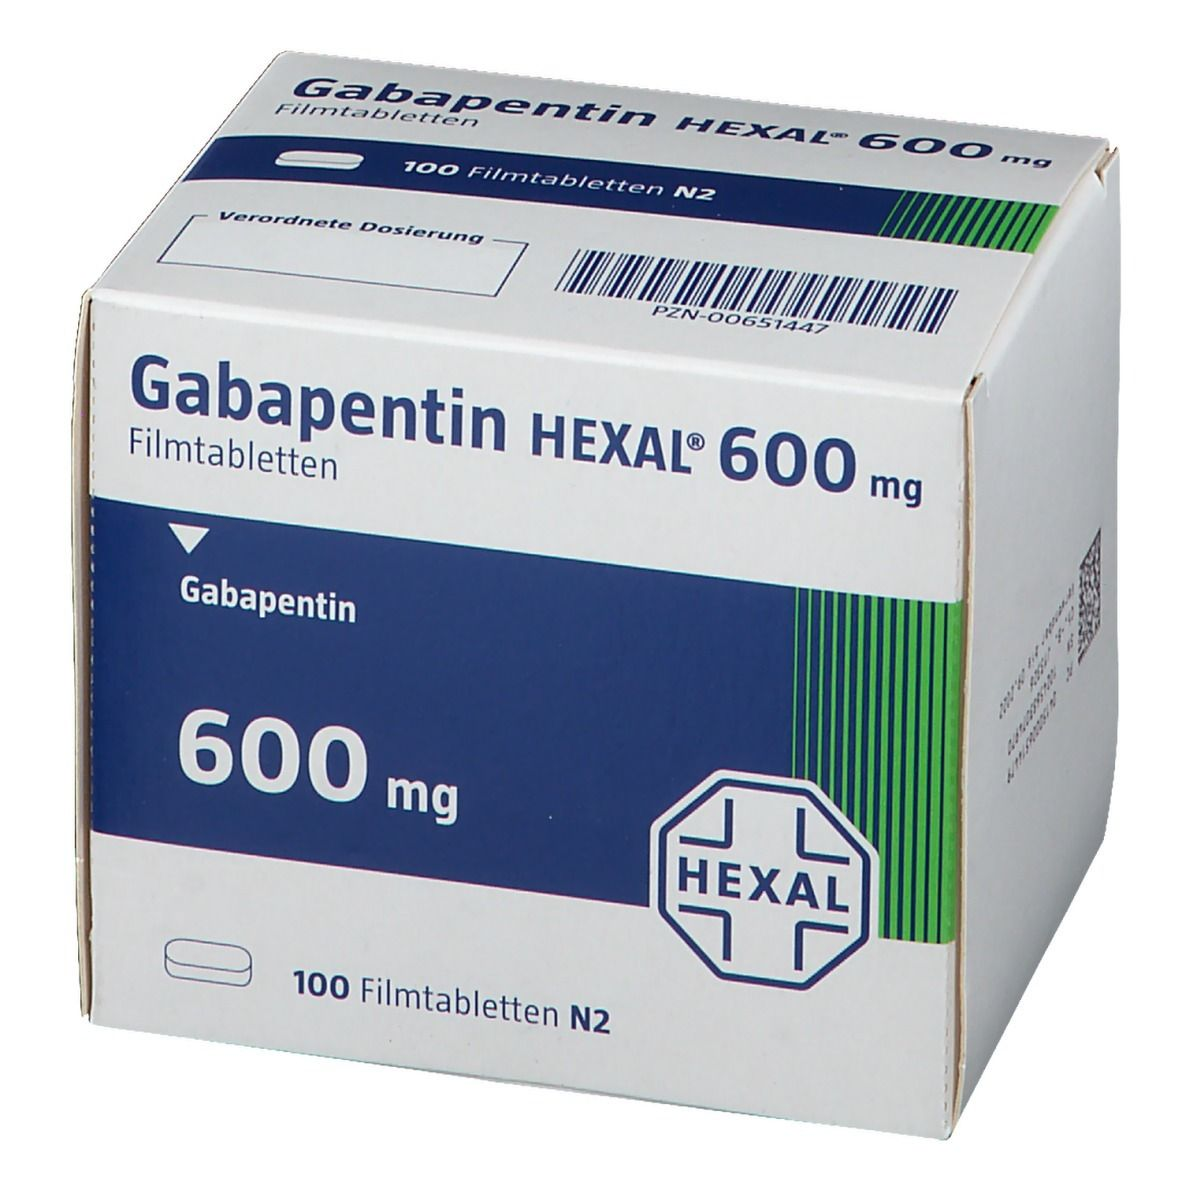 Gabapentin Hexal 600 mg Filmtabletten